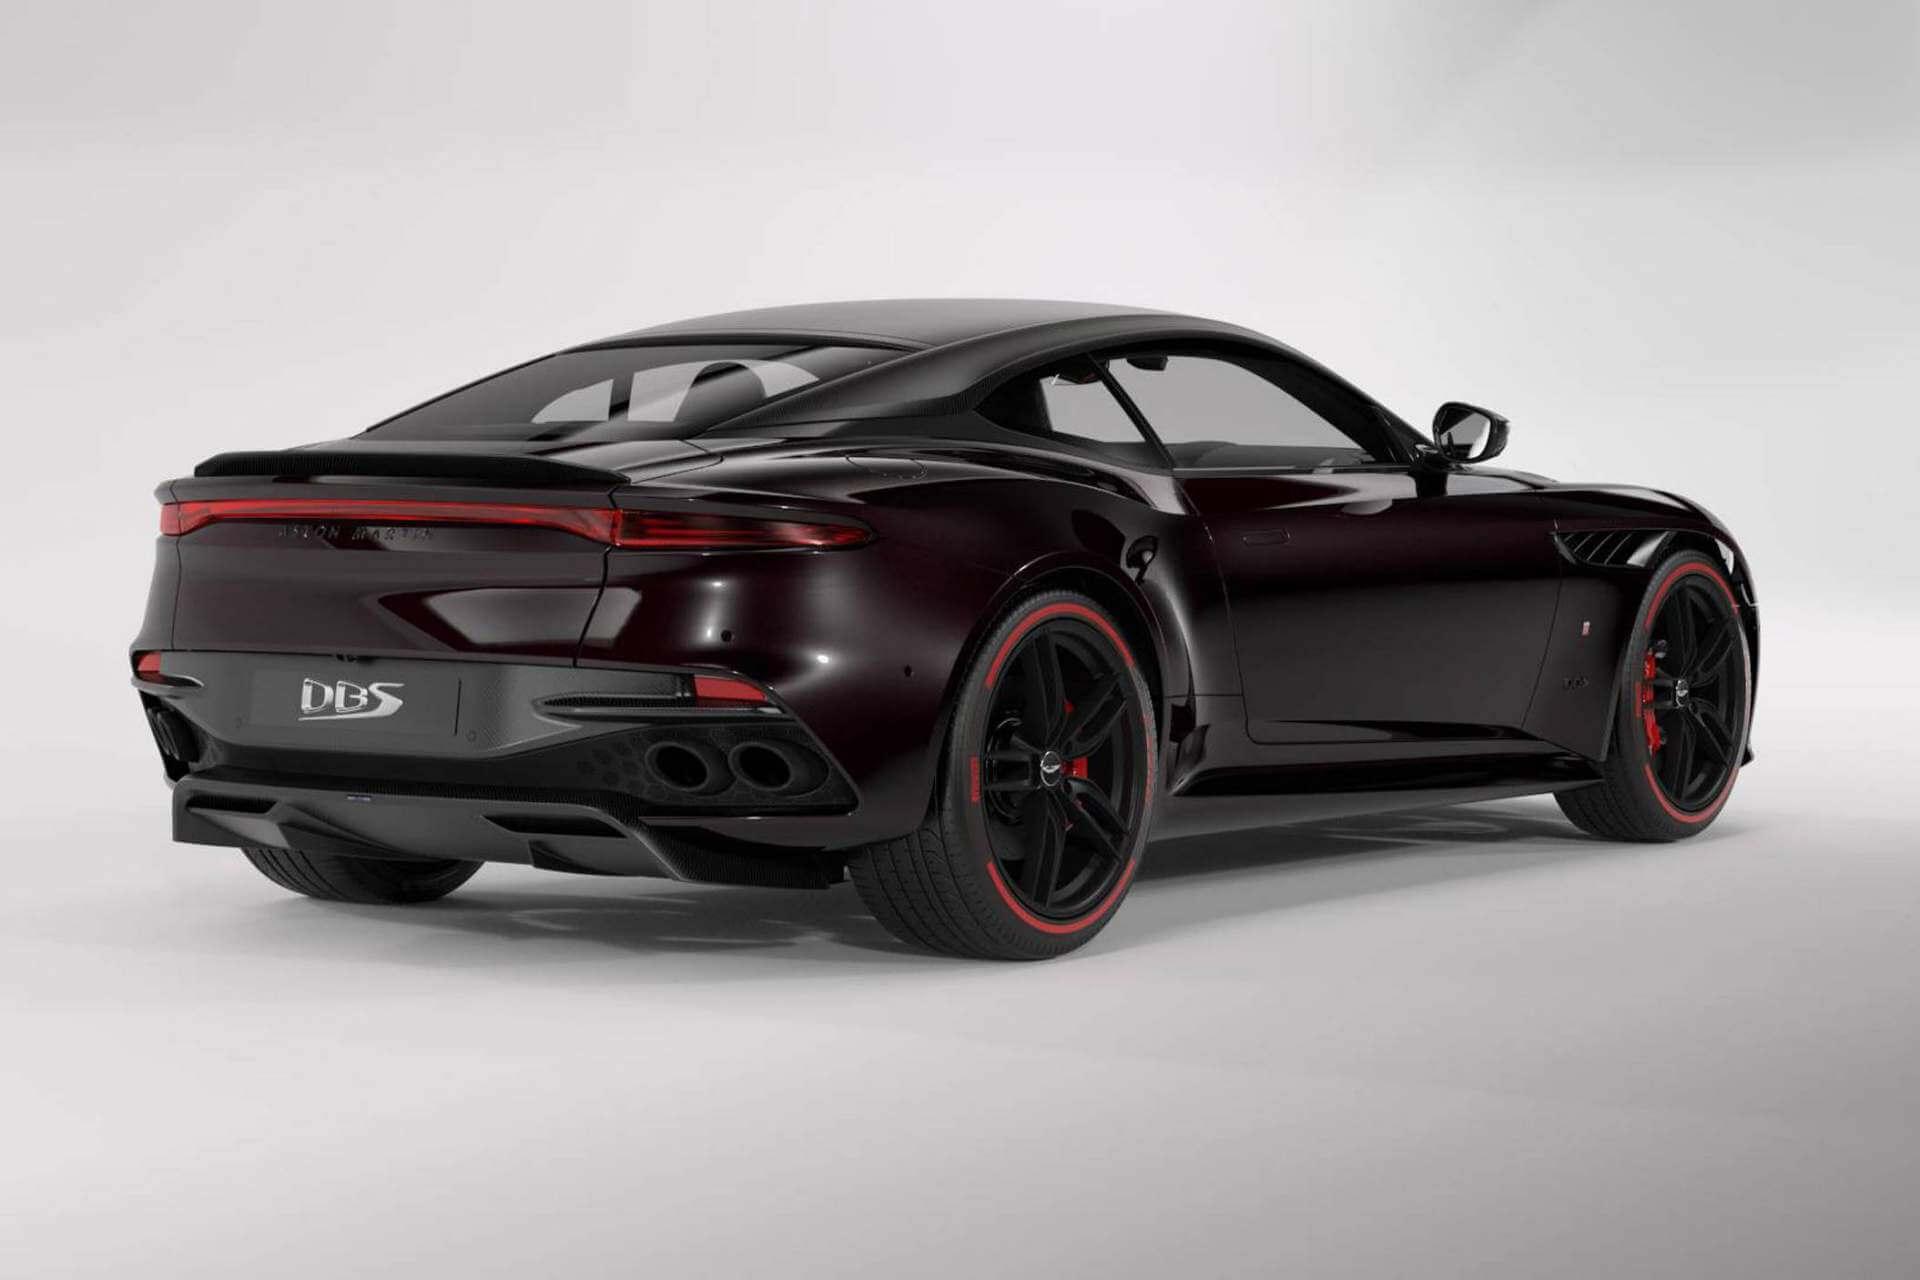 Zaga del Aston Martin DBS Superleggera TAG Heuer.